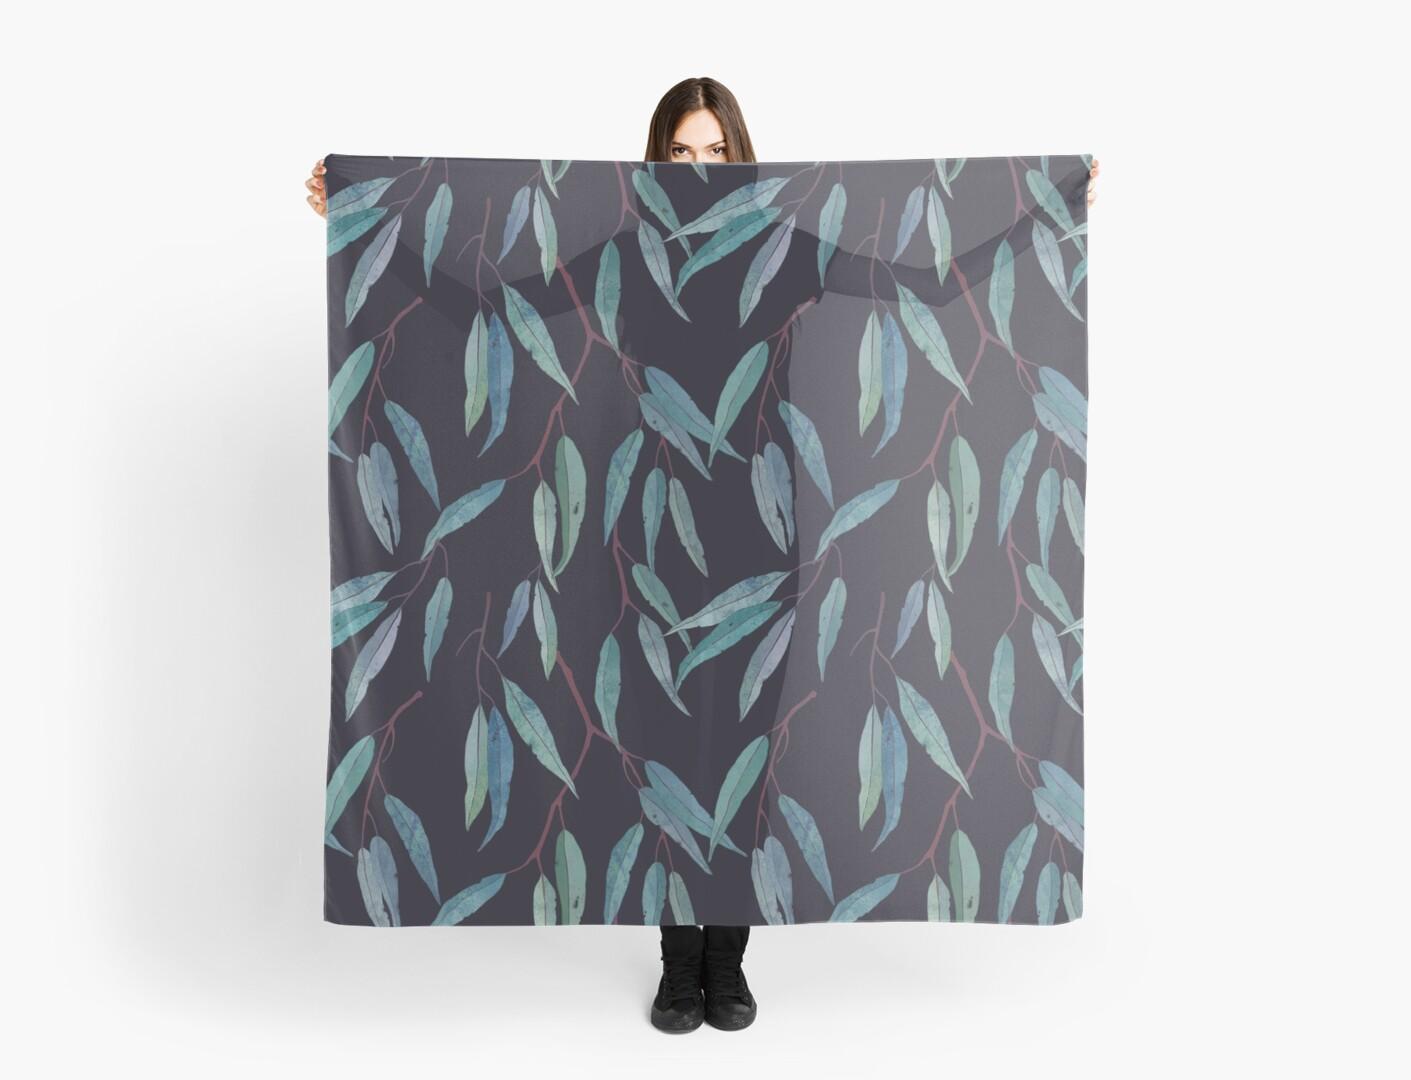 Eukalyptusblatter Tuch By LavishSeason